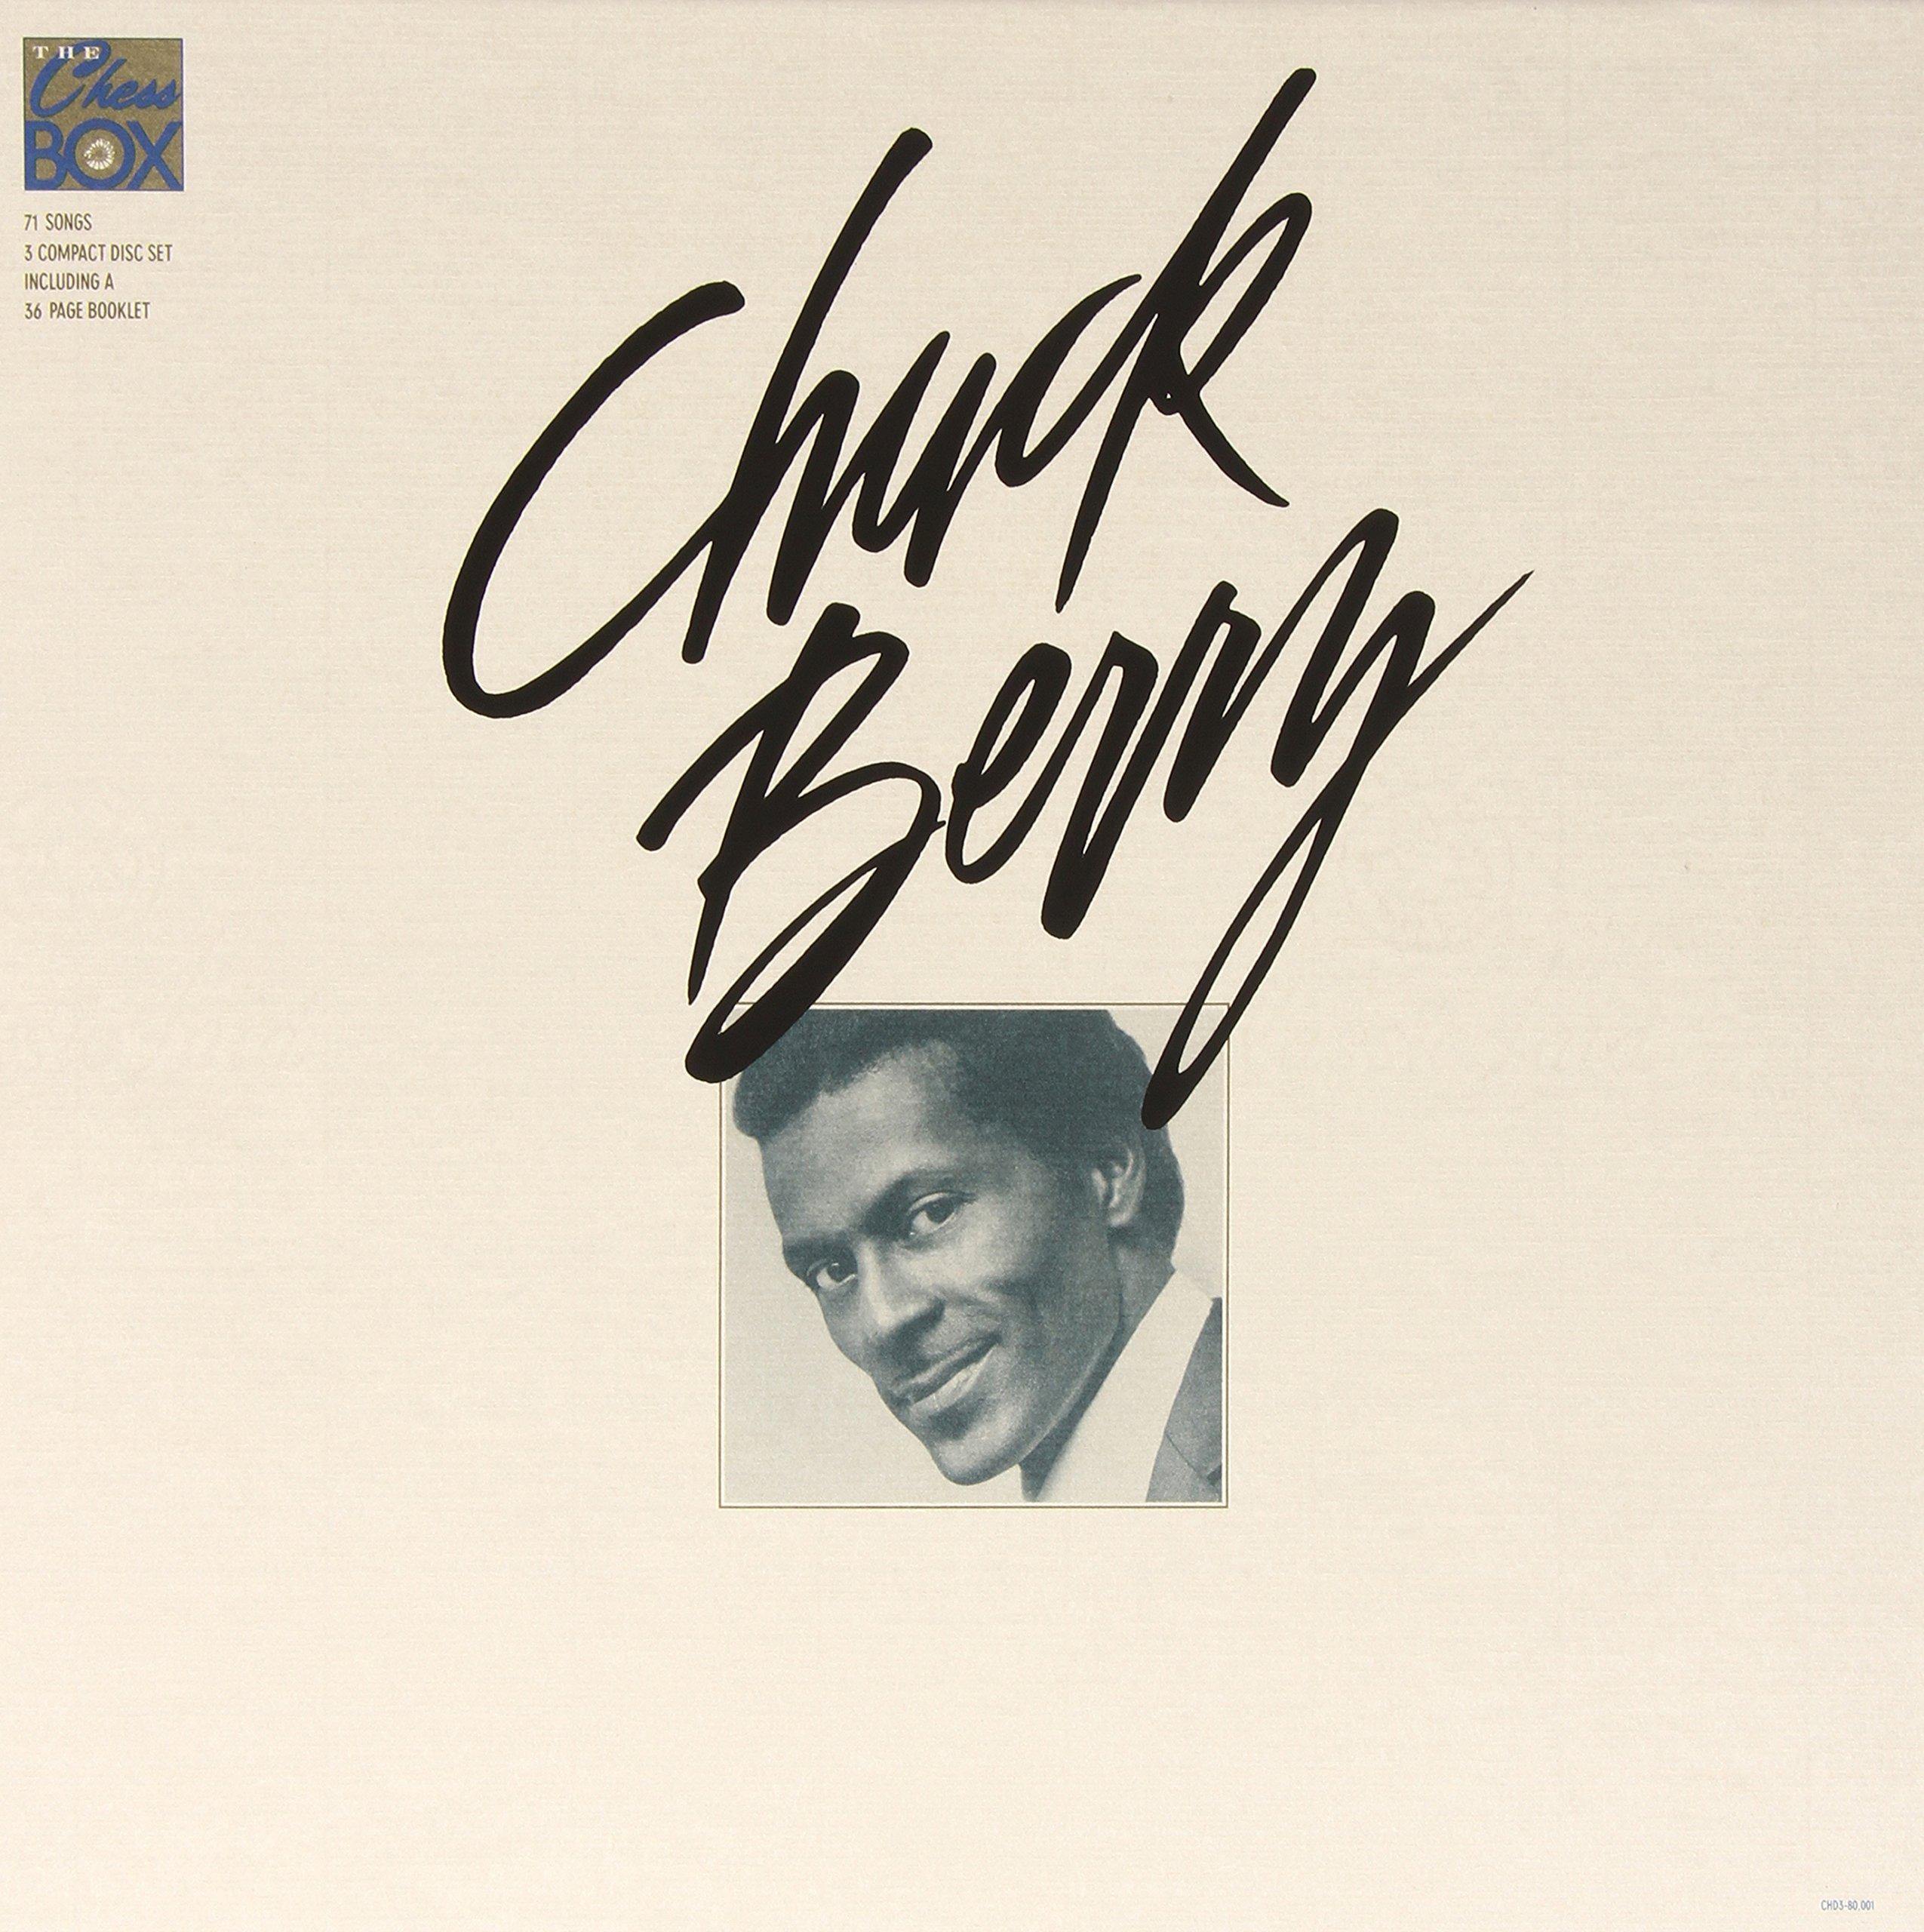 Chuck Berry (Chess Box)